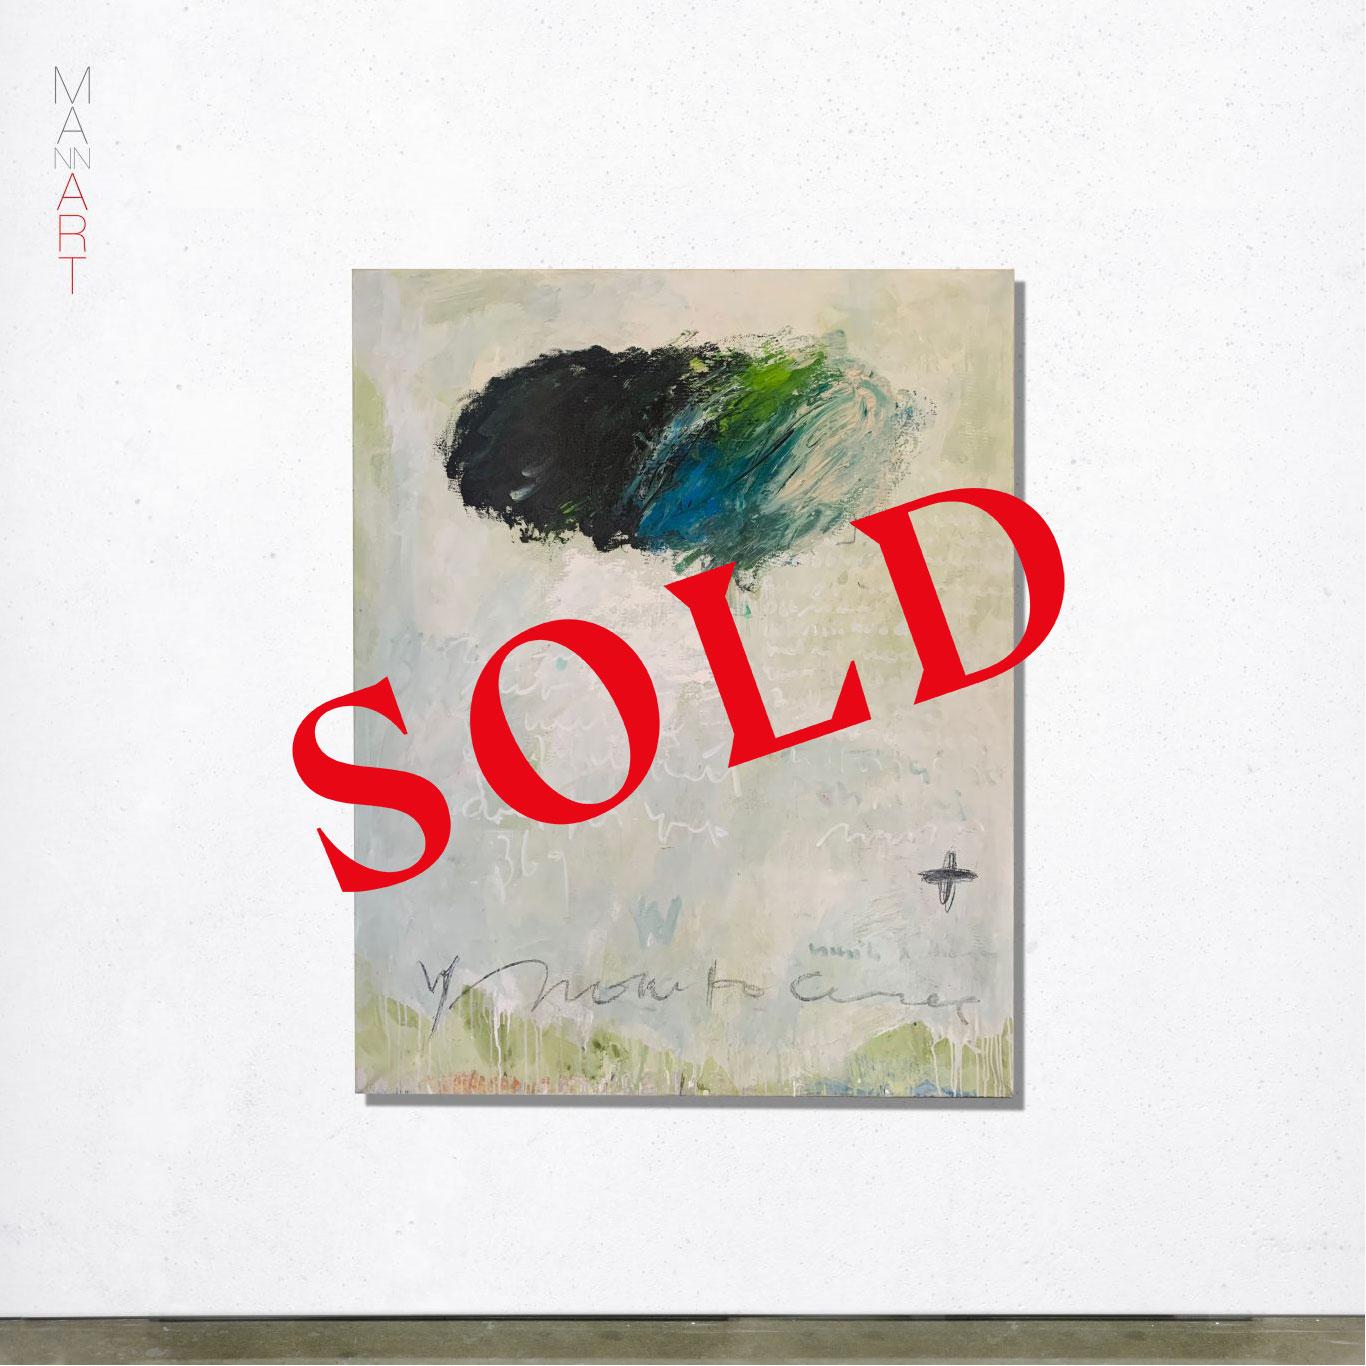 MANNA Art Bigcloud - Sold